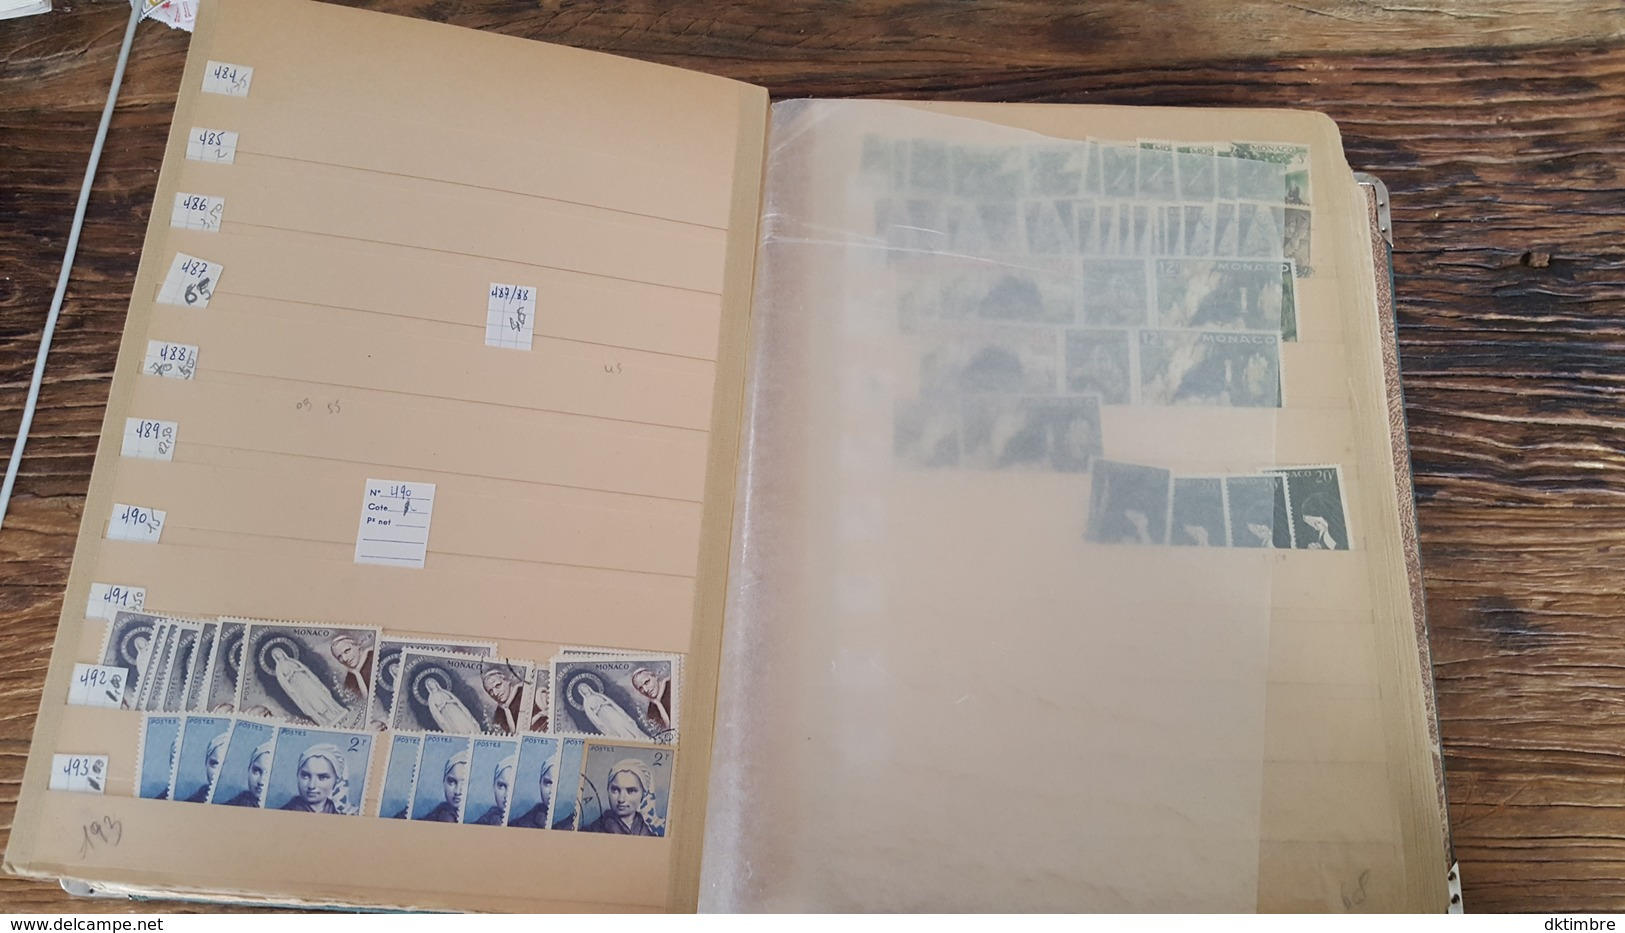 LOT 440188 ALBUM TIMBRE DE STOCK MONACO GROSSE COTE AFFAIRE A SAISIR PORT A 15 EUROS - Timbres